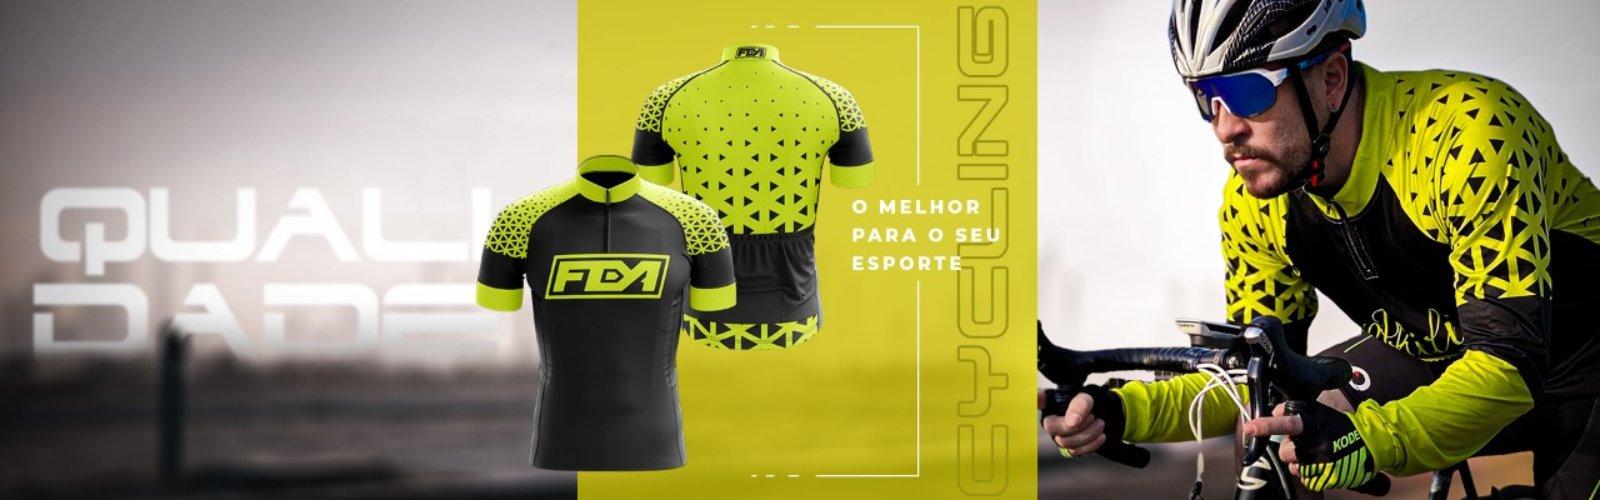 banner_ciclismo_novo_2